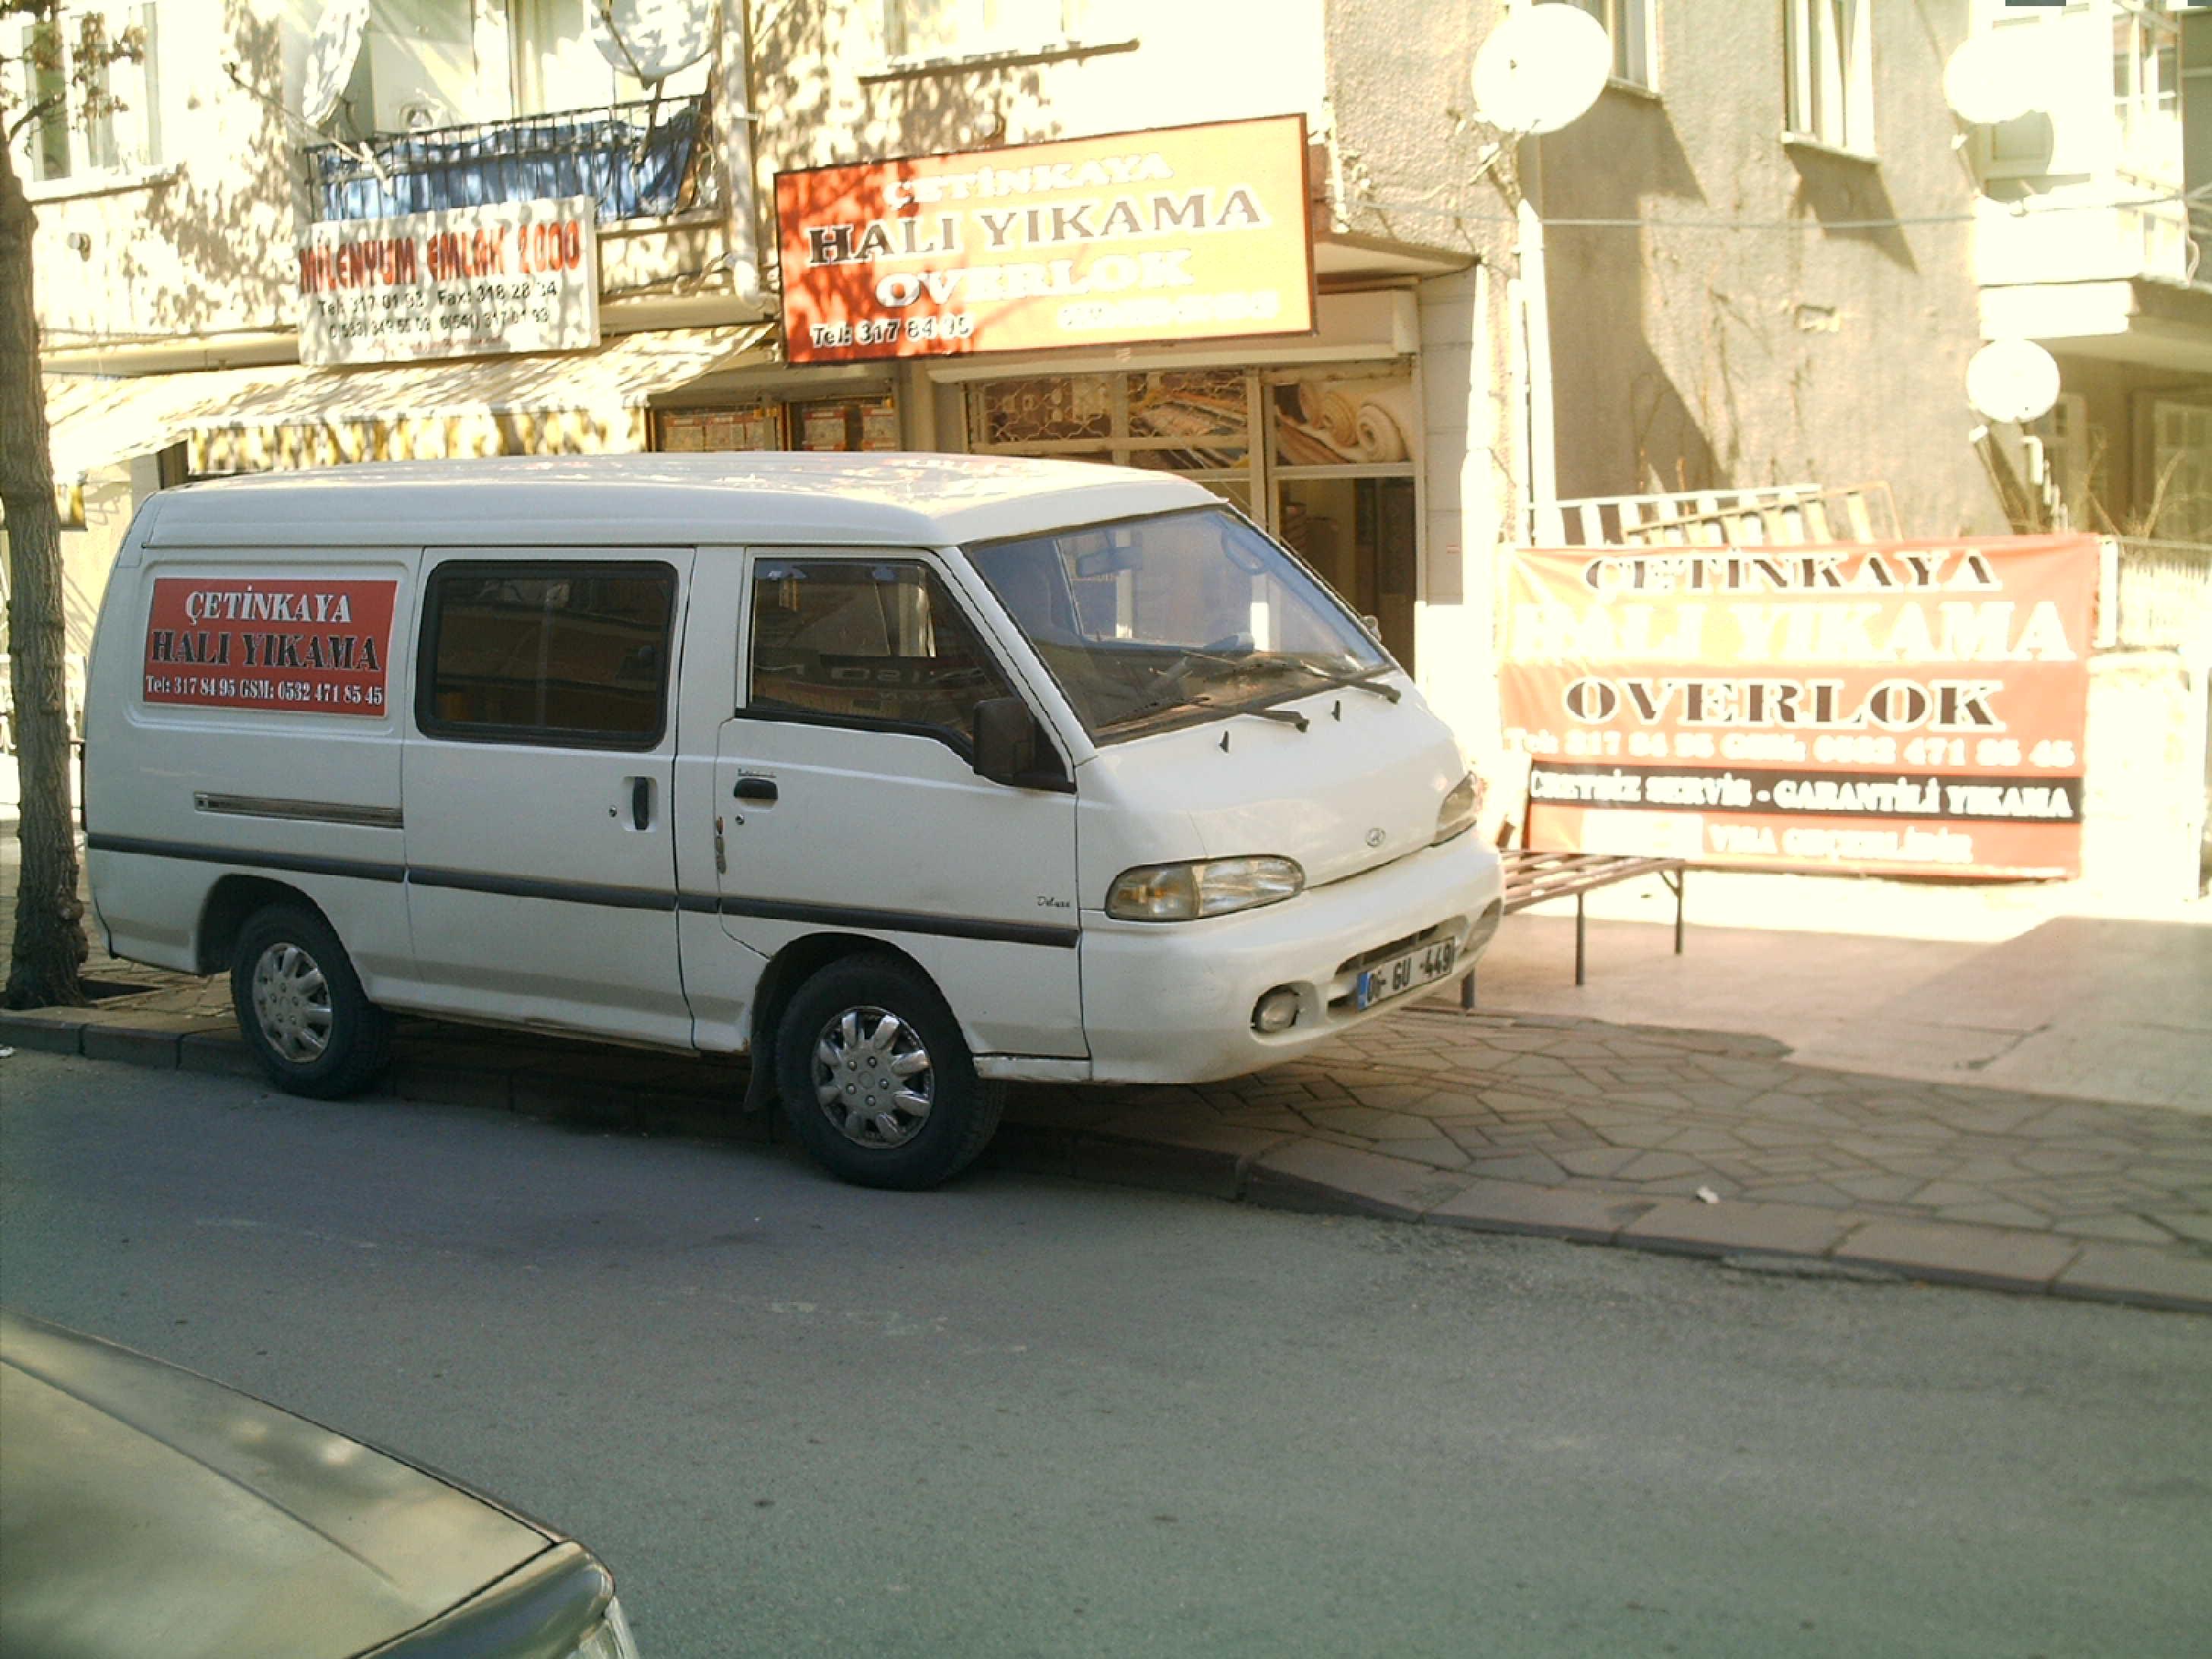 mebusevler_hali_yikama_servis